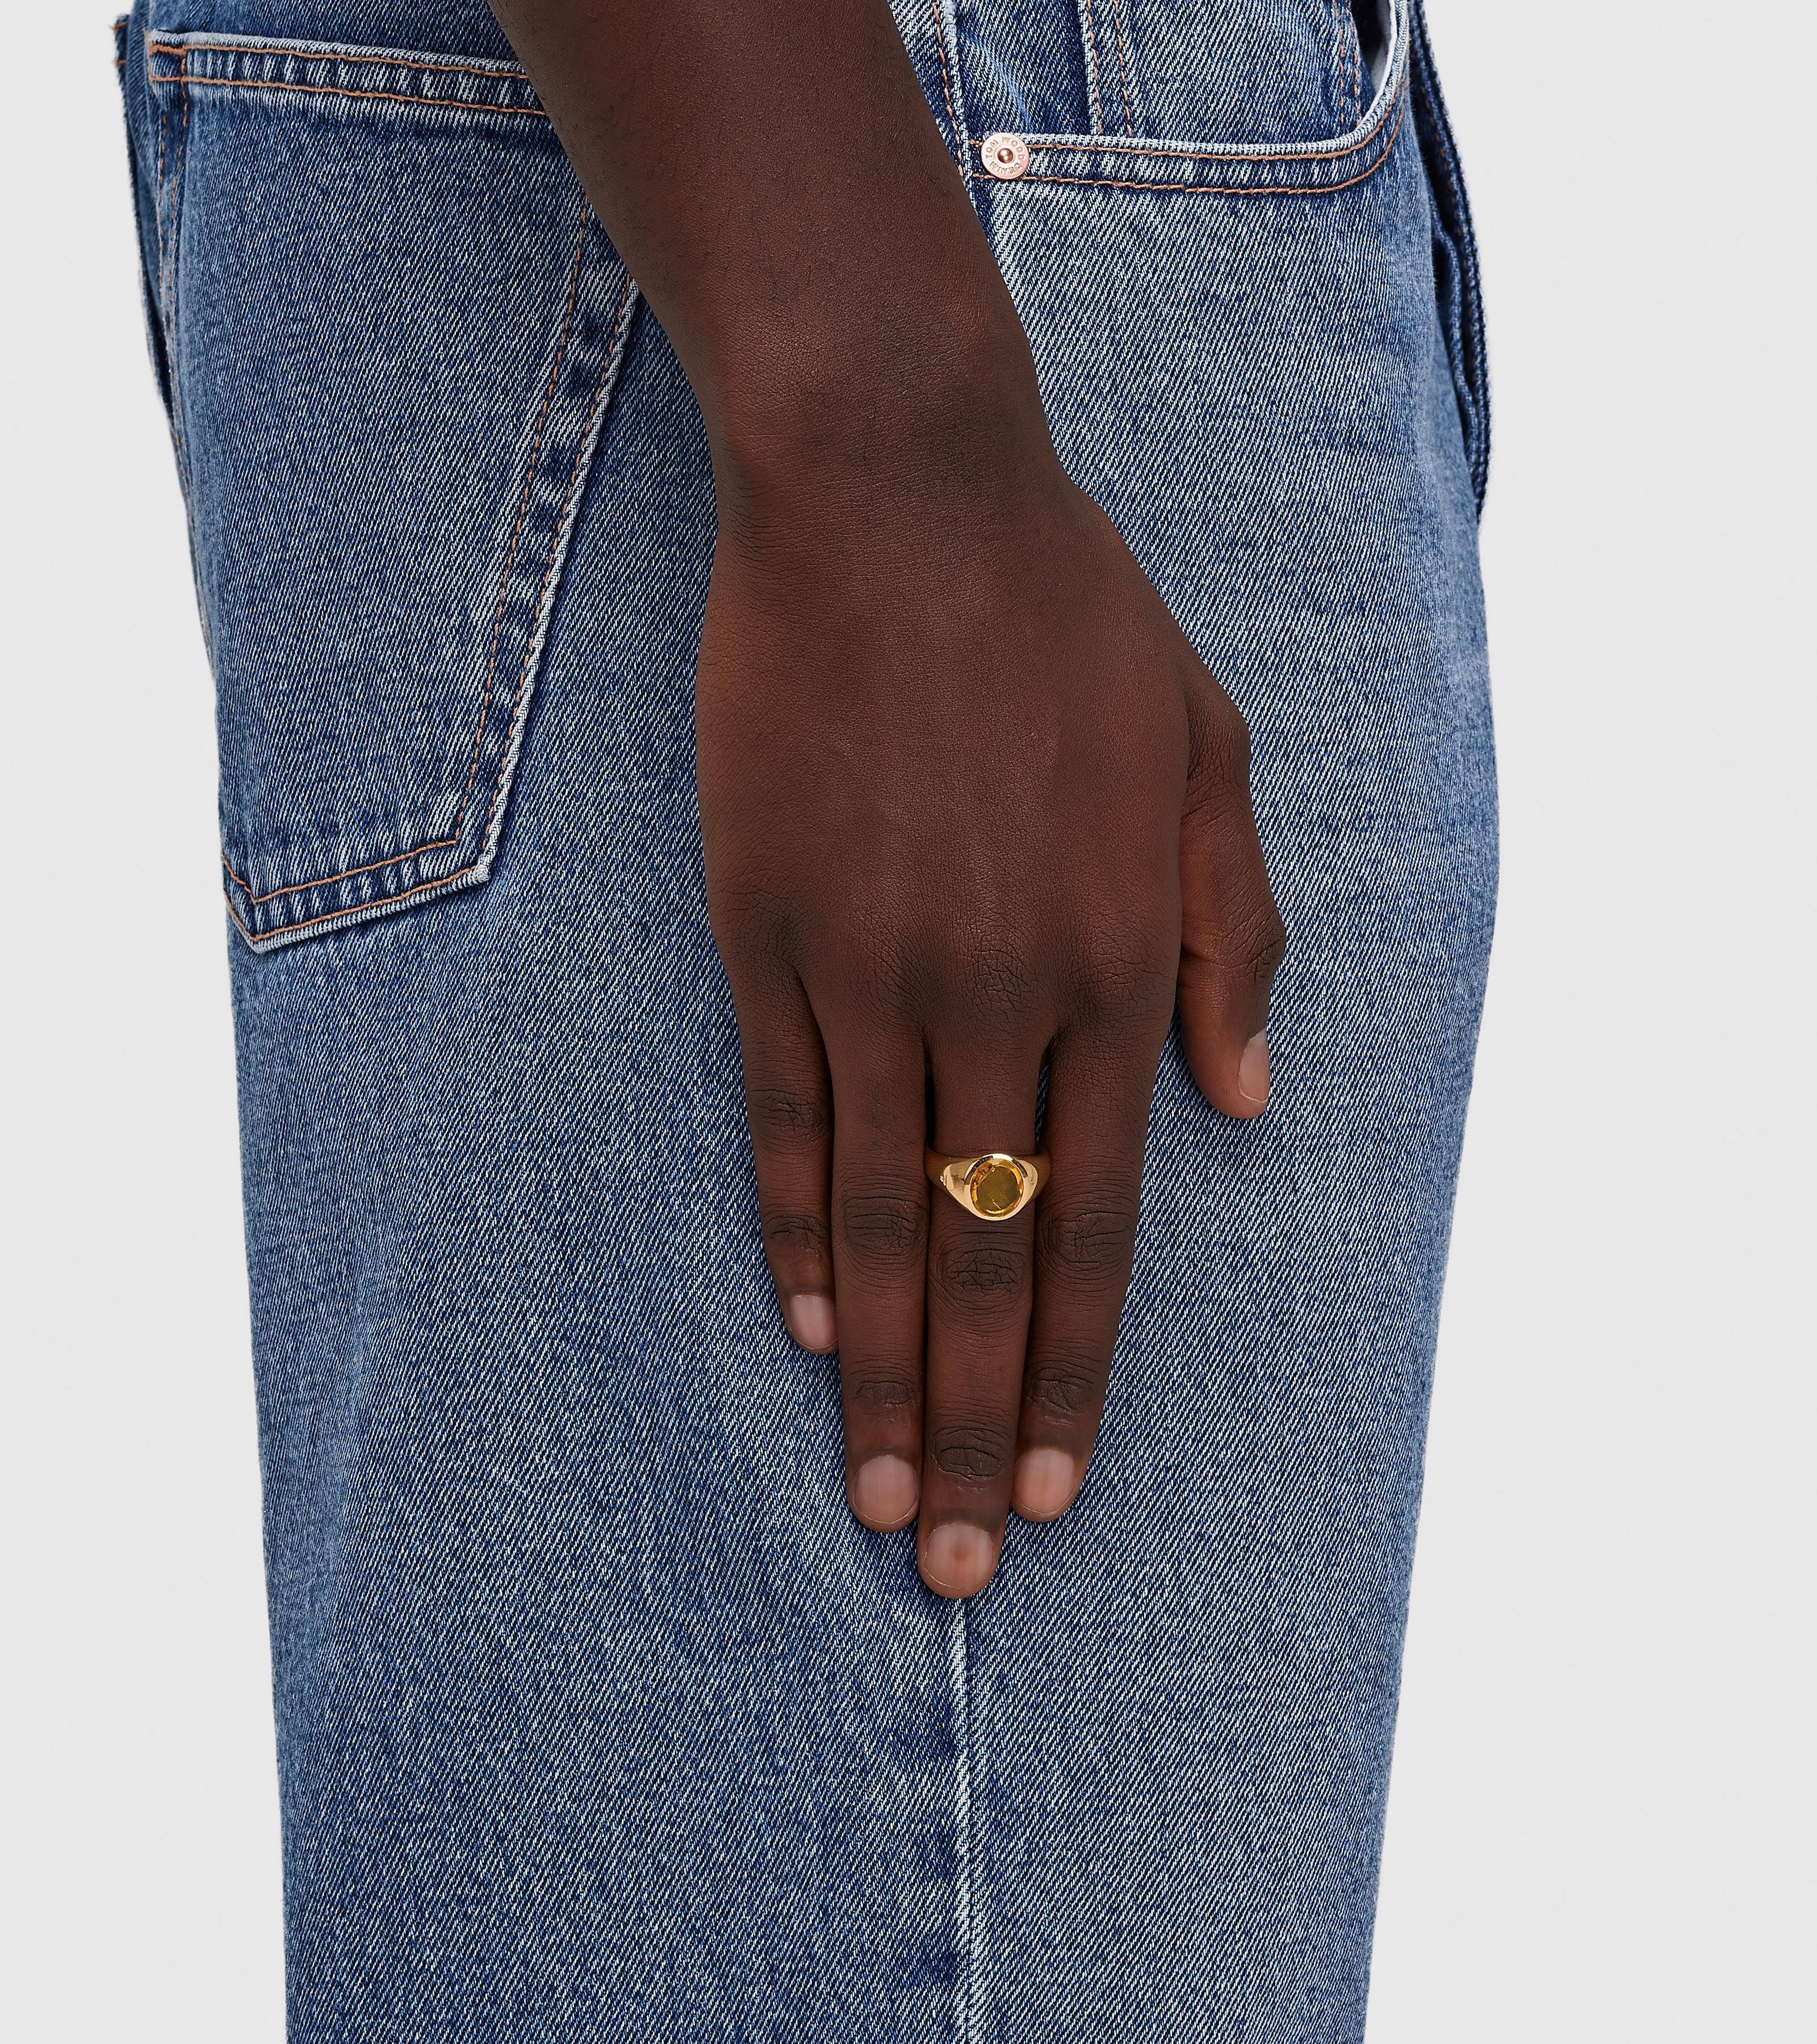 Lizzie Ring Orange Amber Gold